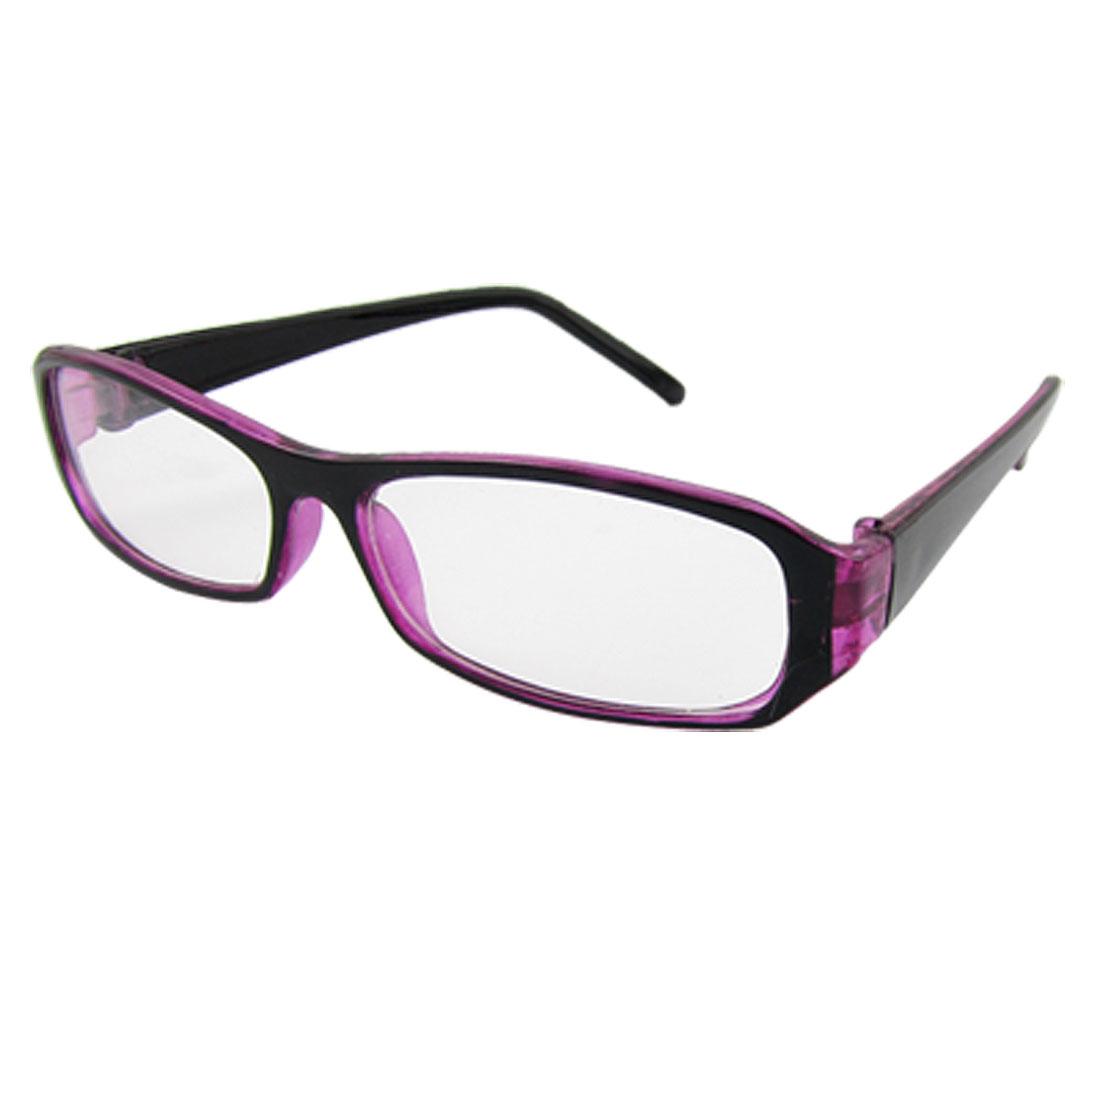 Ladies Black Purple Plastic Rectangle Frame Plain Glass Spectacles